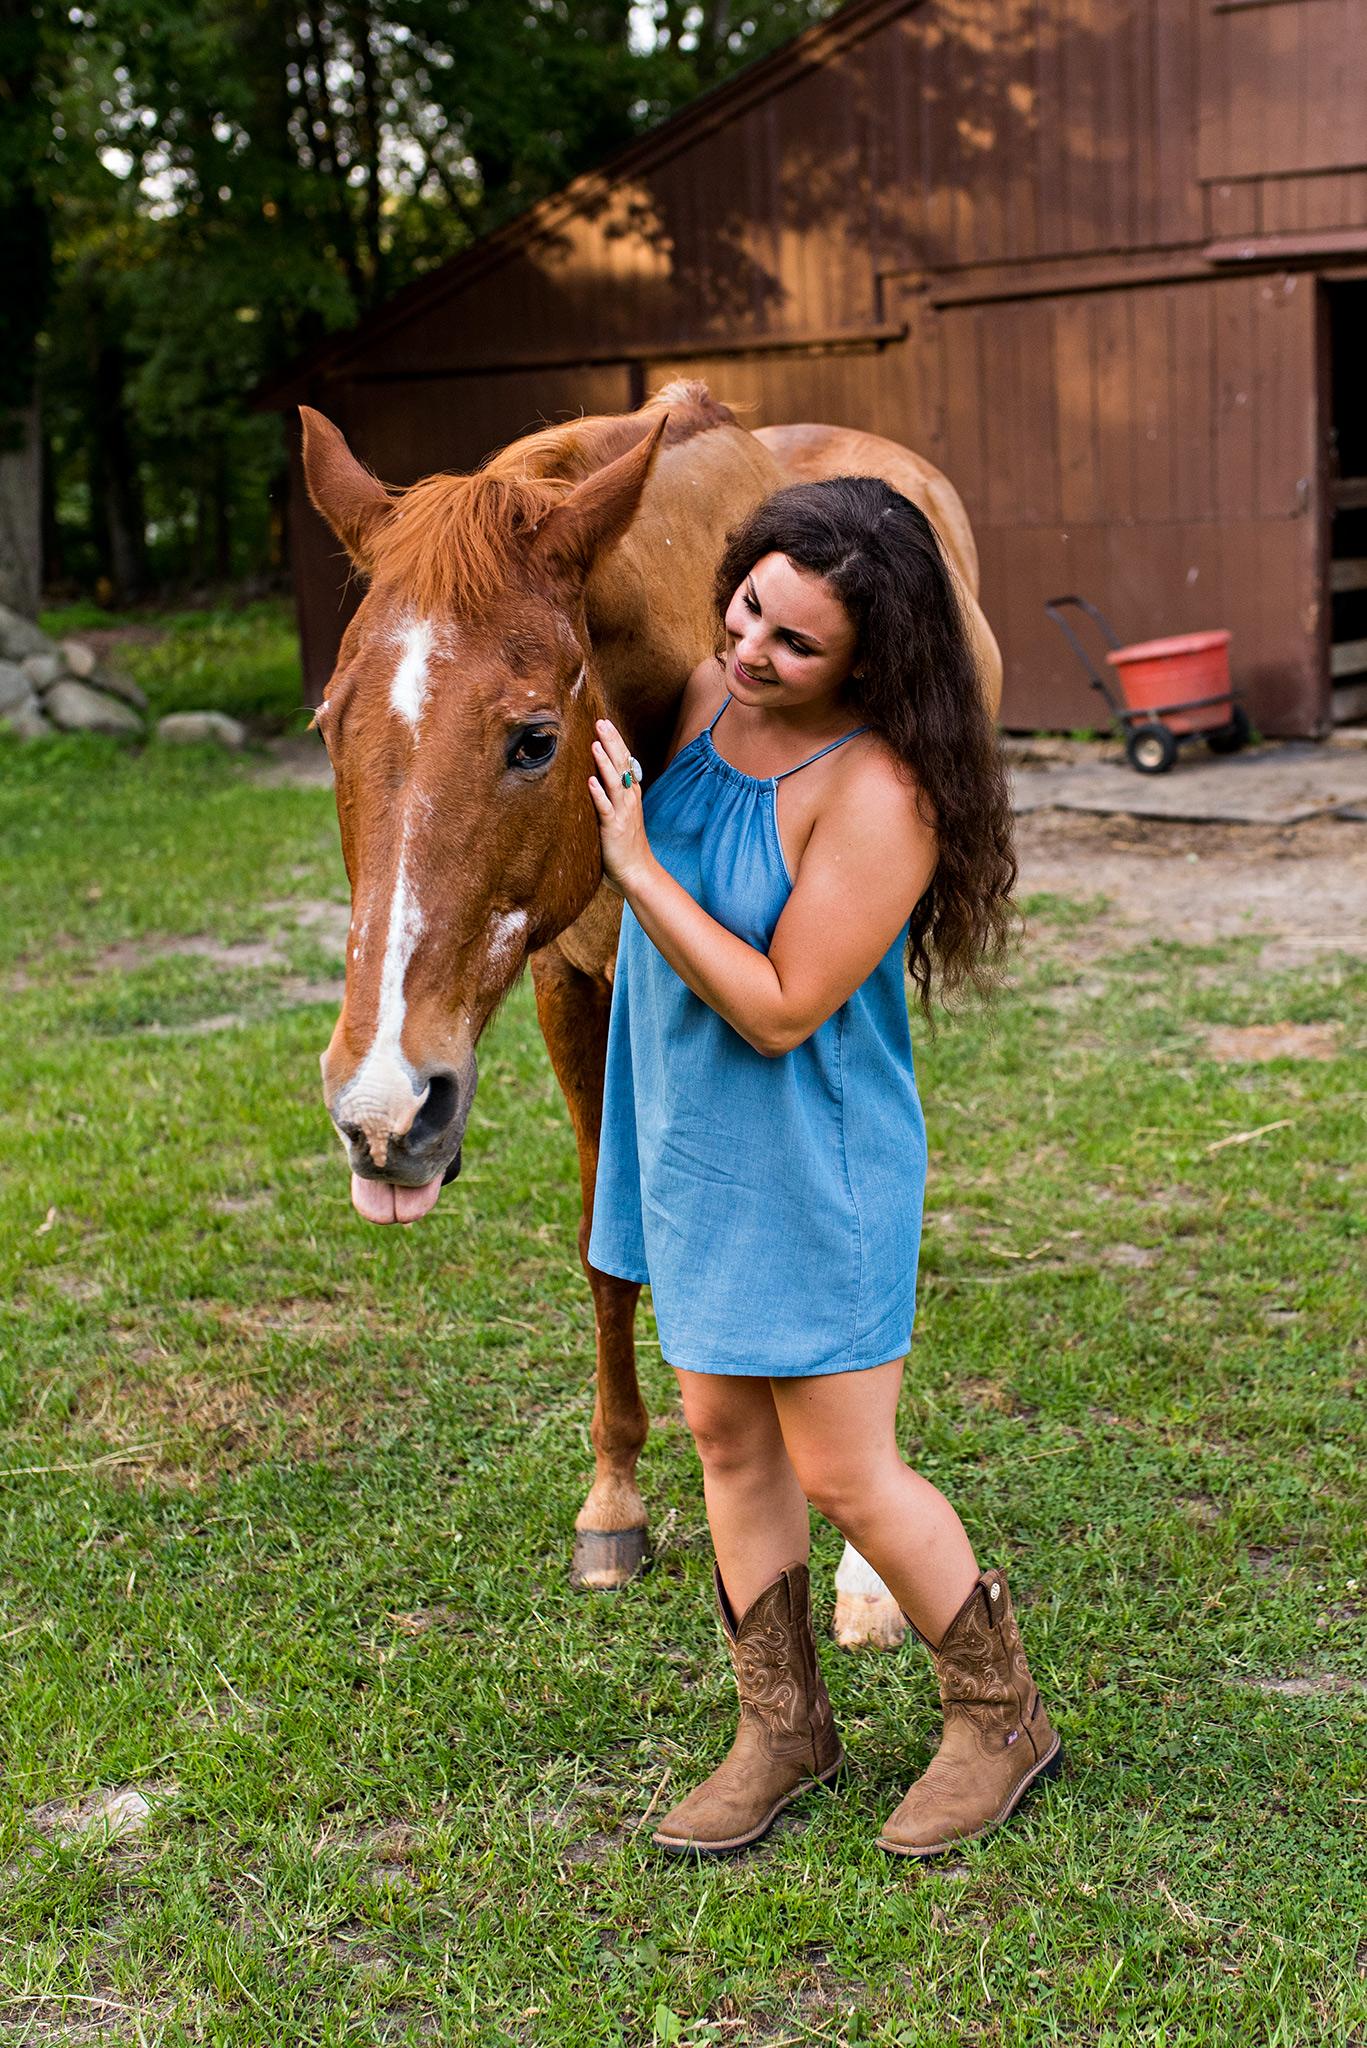 connecticut high school senior portrait photography with a horse on a farm